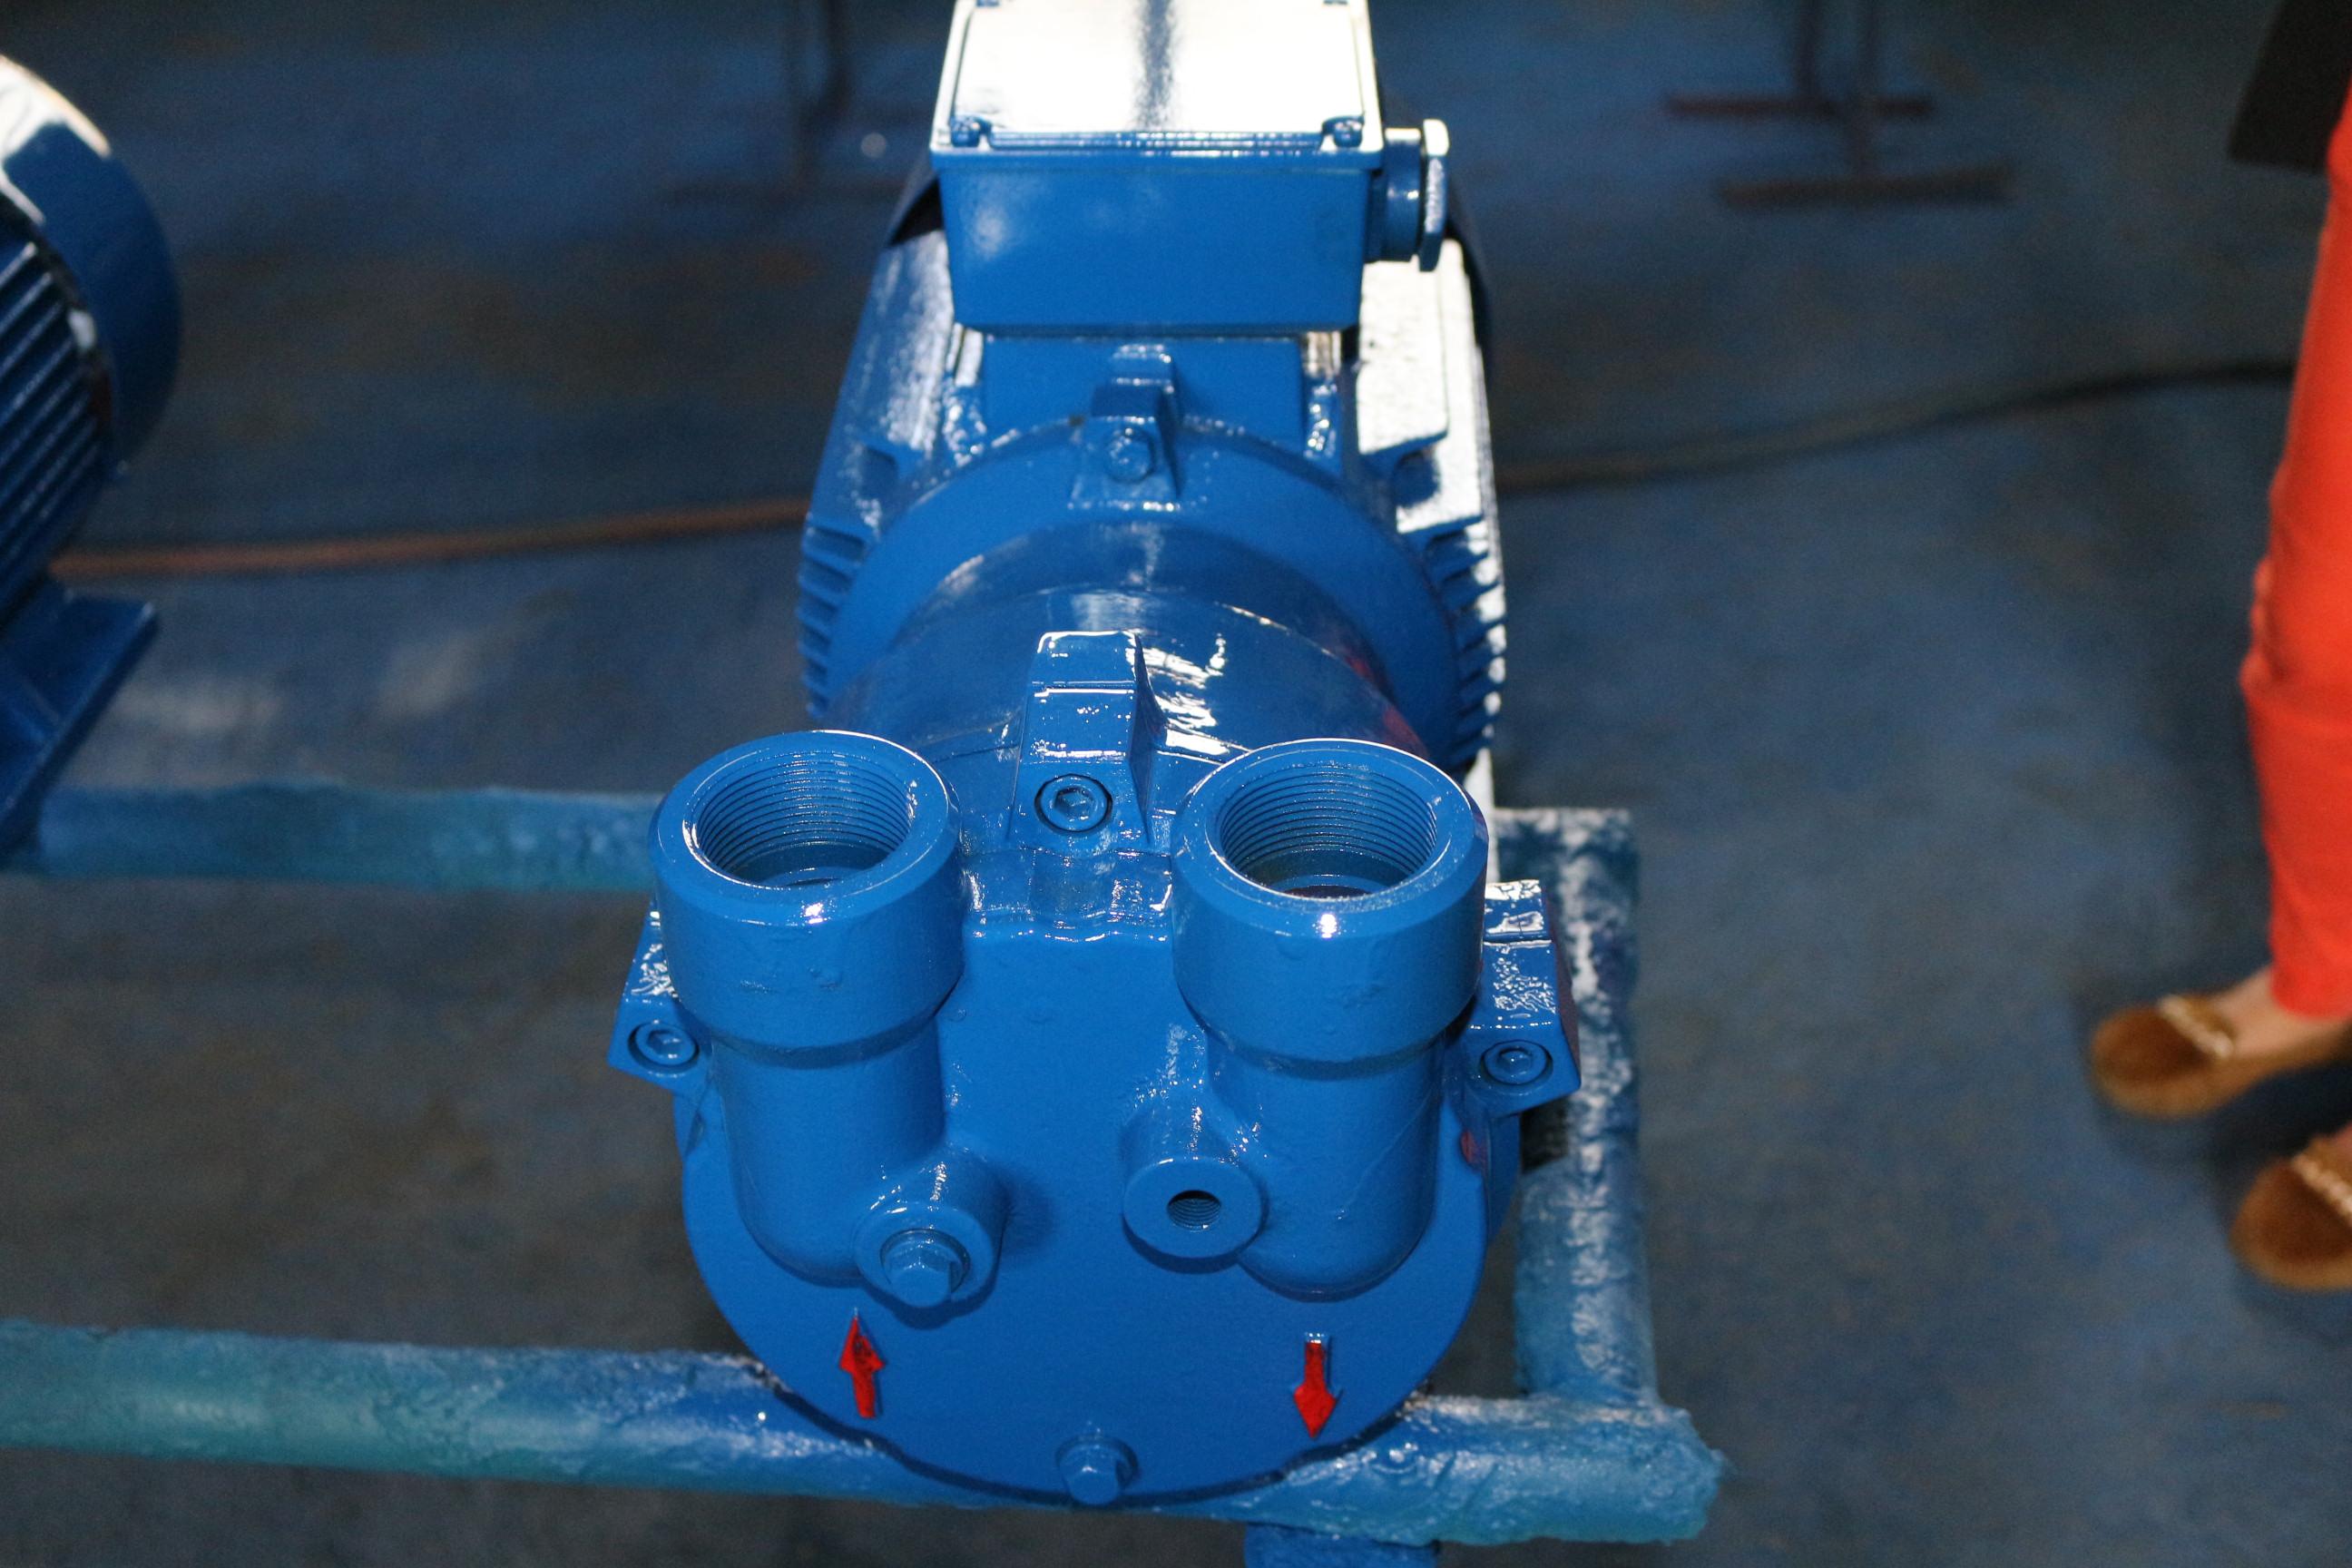 SK-1.8B水环式真空泵_SK-1.8B水环式真空泵品牌